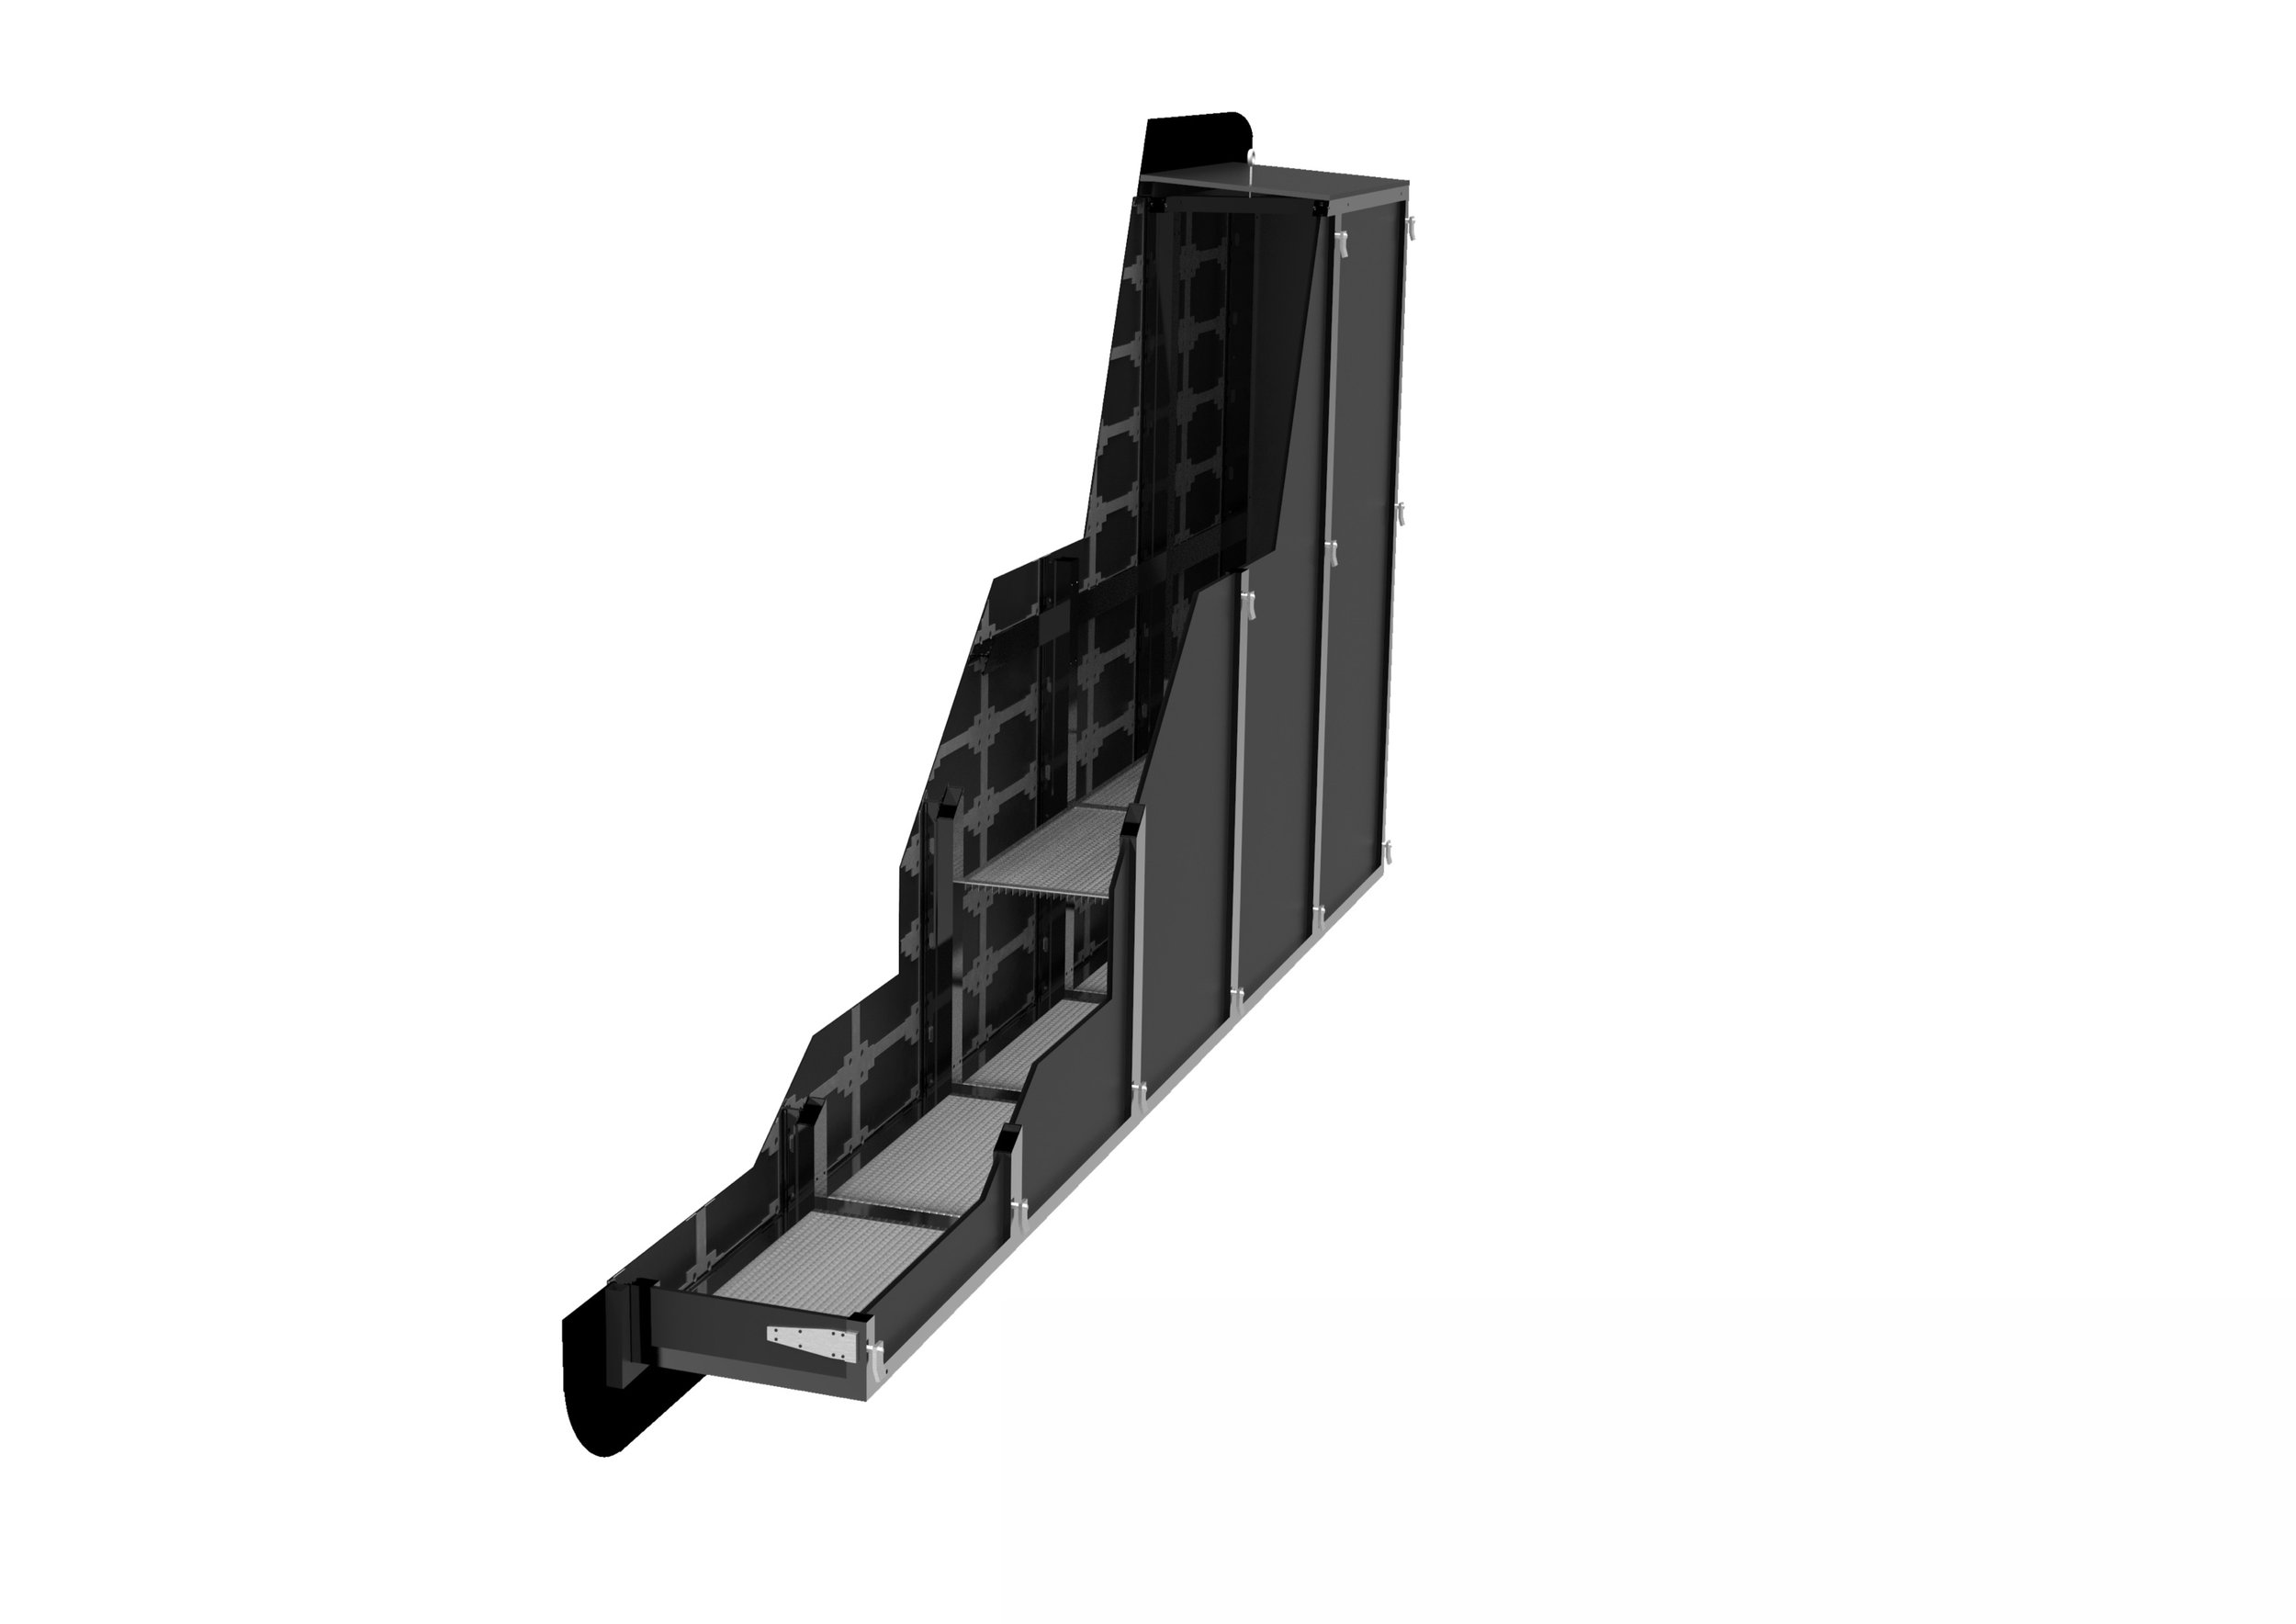 D48 Frame - Ben Dresner-Reynolds 9.11.18 3.jpg